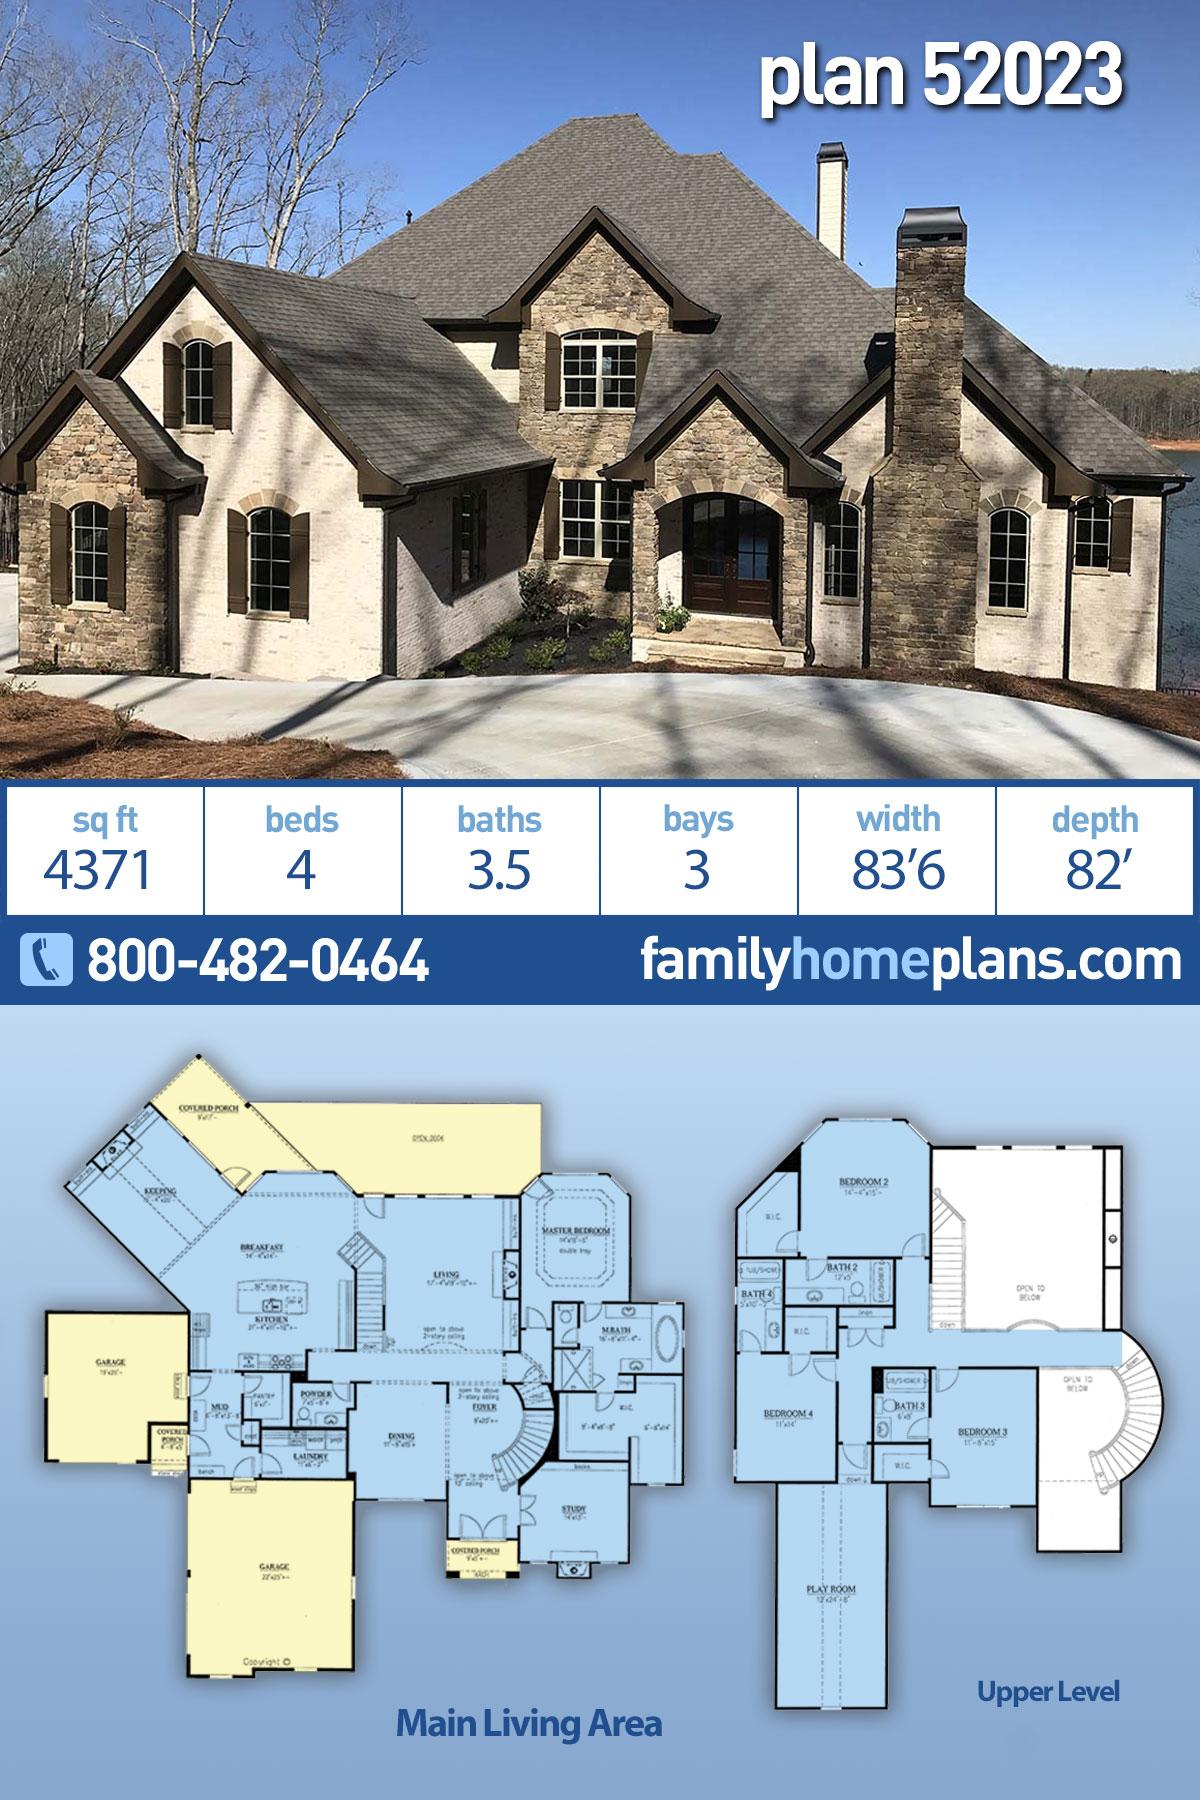 European House Plan 52023 with 4 Beds , 5 Baths , 3 Car Garage